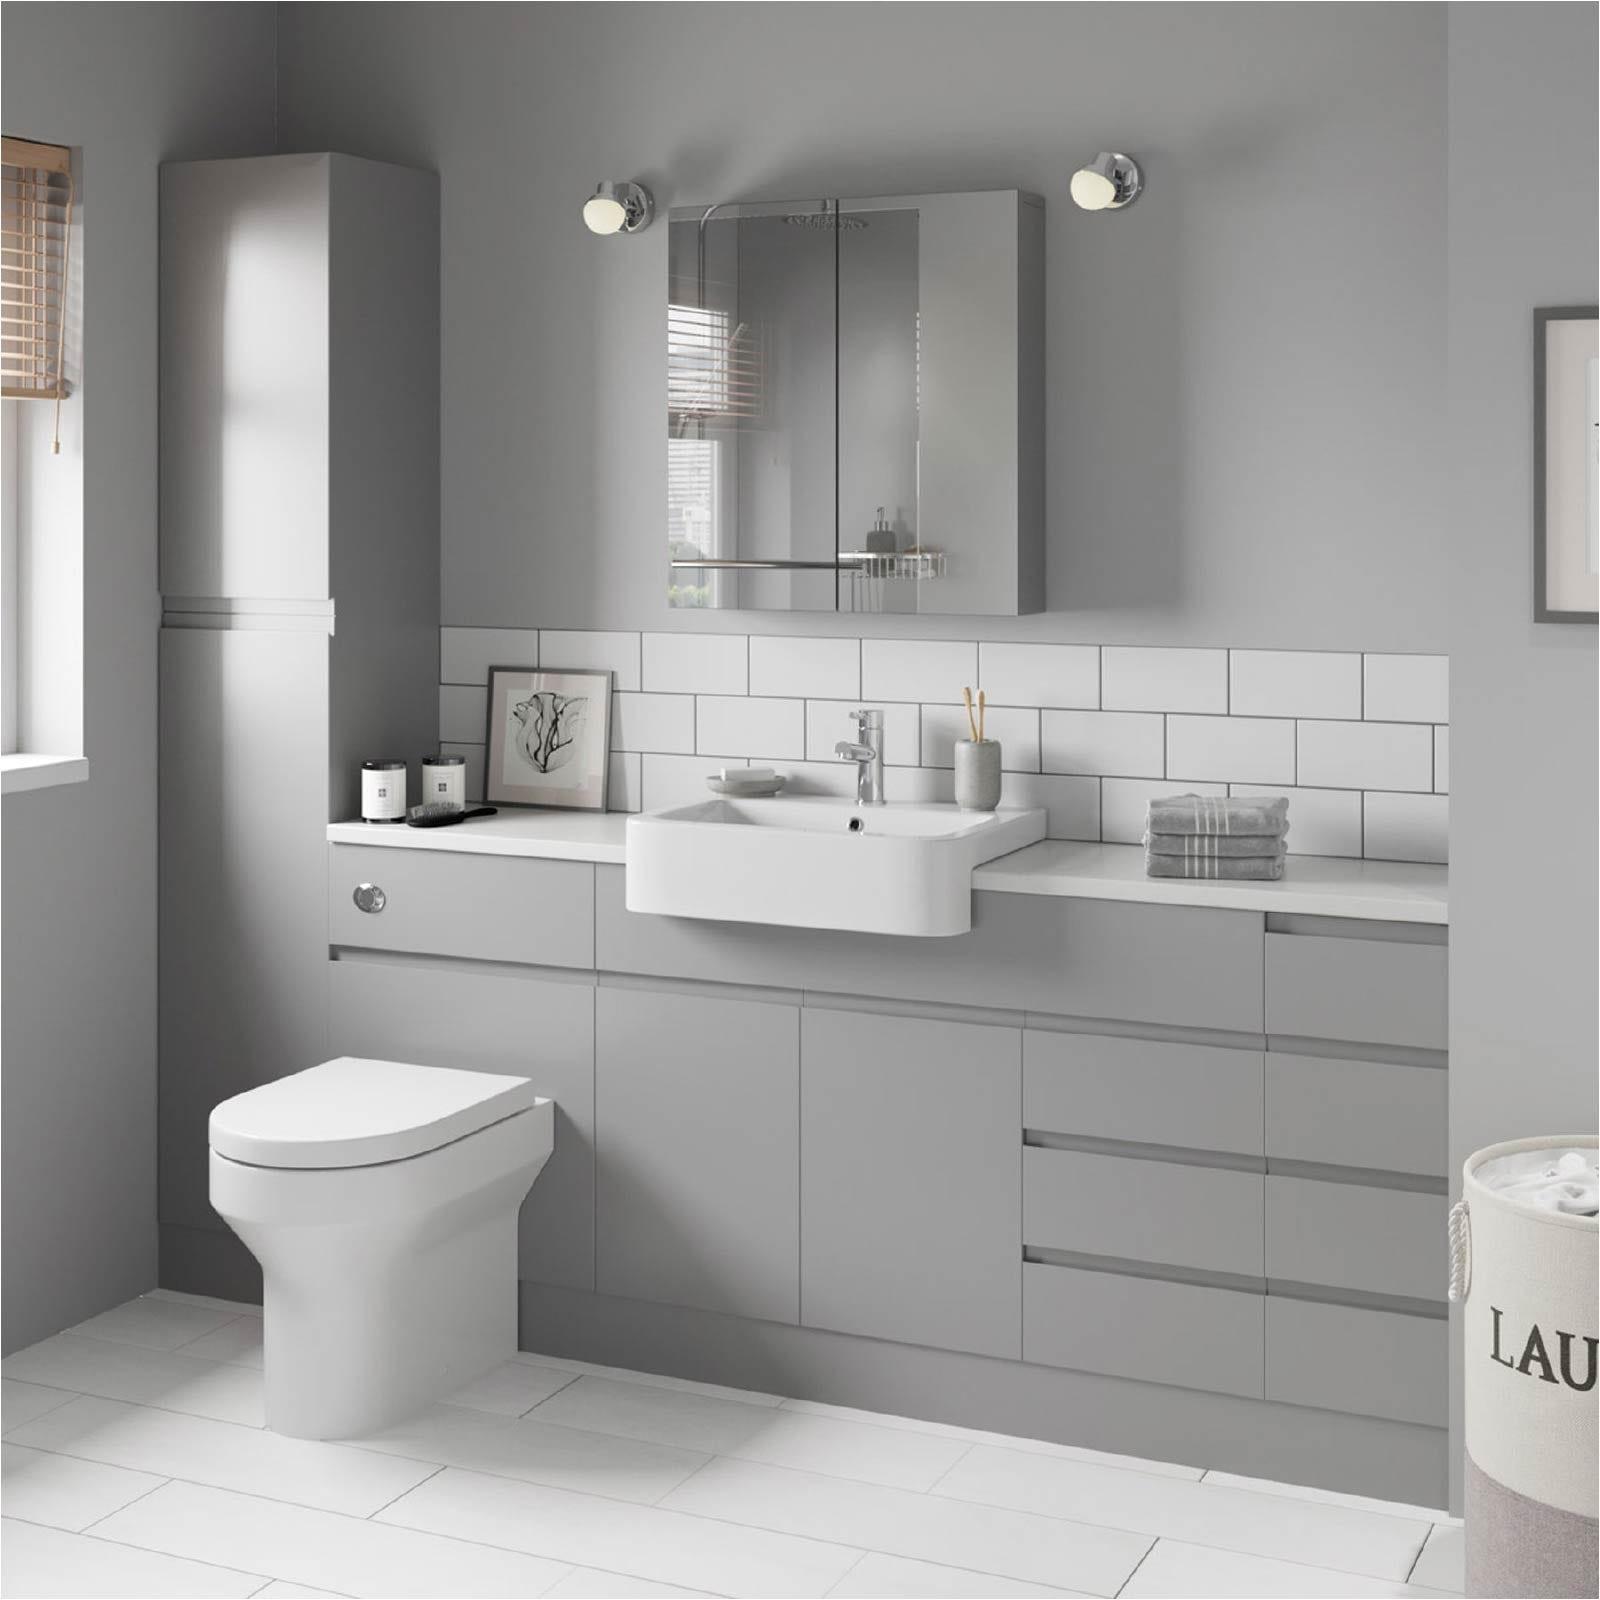 Bathroom vanity units buying guide  VictoriaPlum.com